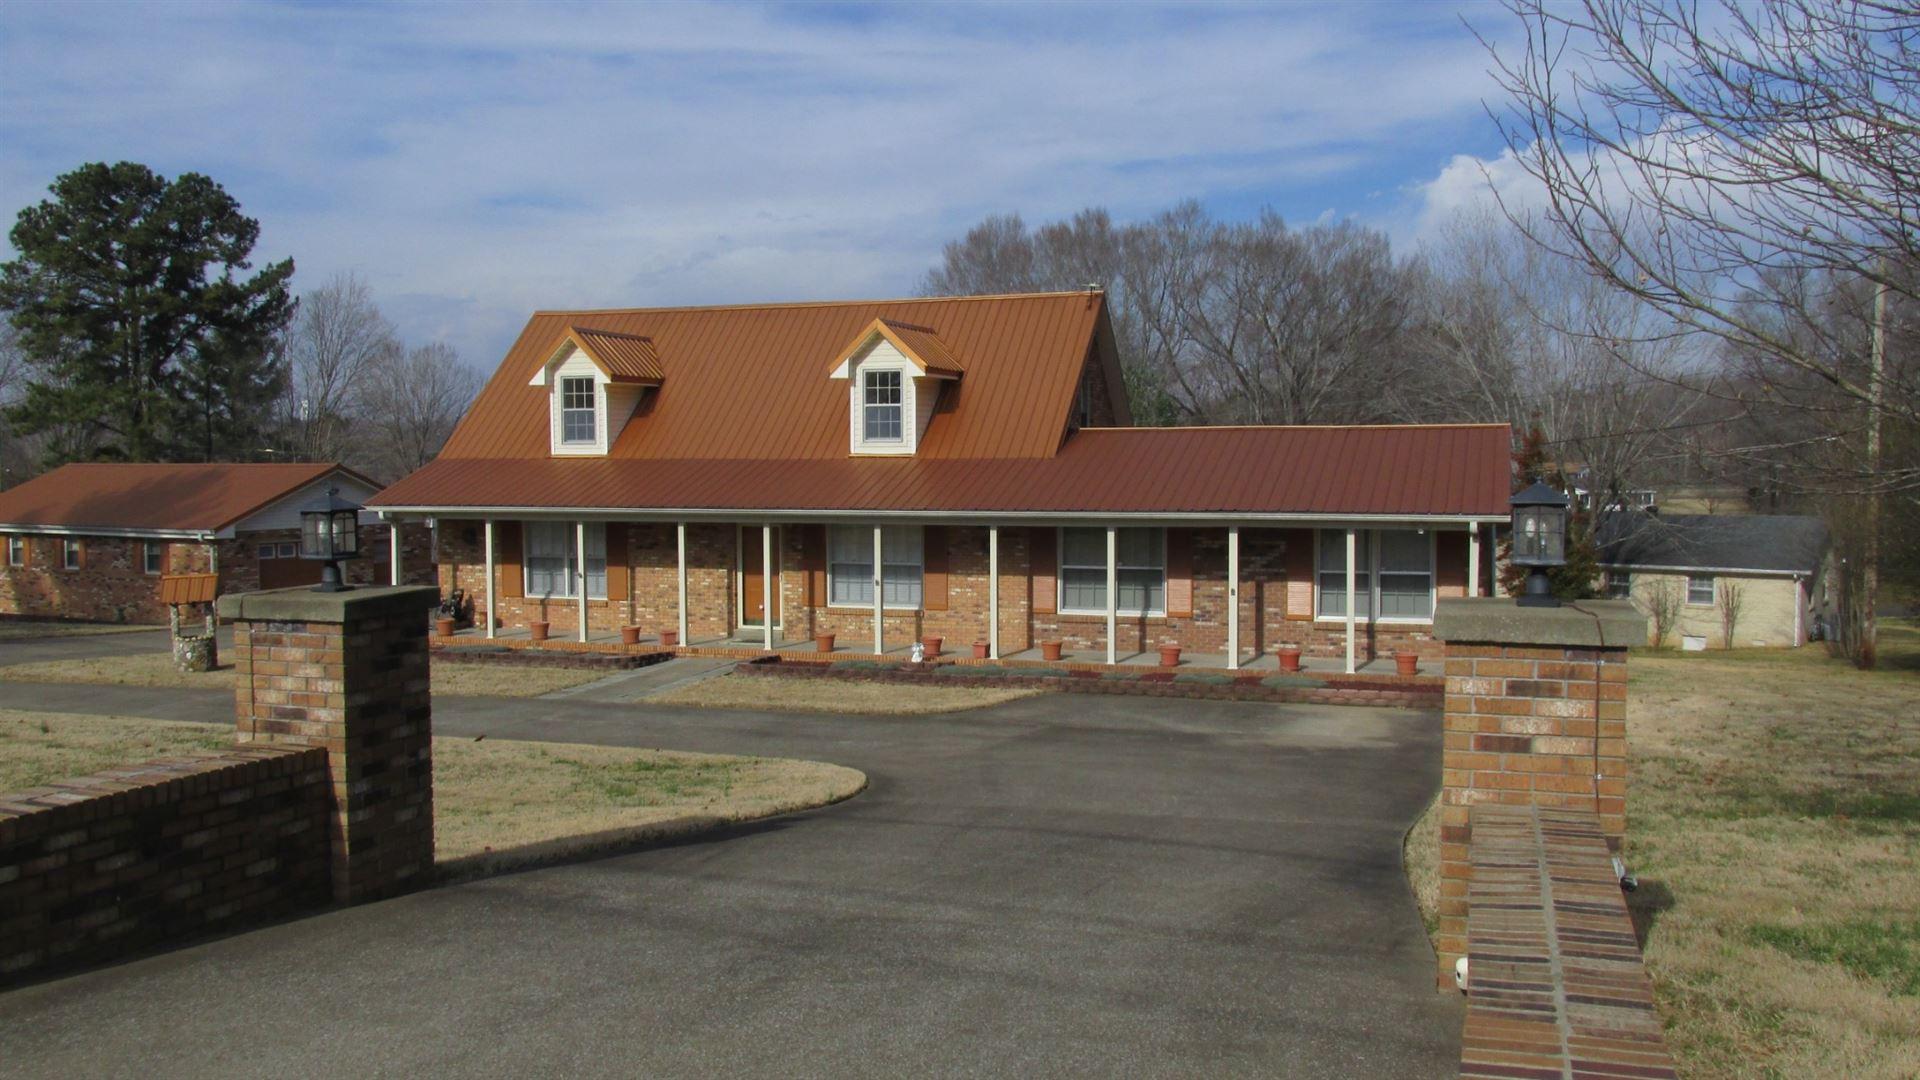 109 Hawkins Rd, Clarksville, TN 37040 - MLS#: 2216333